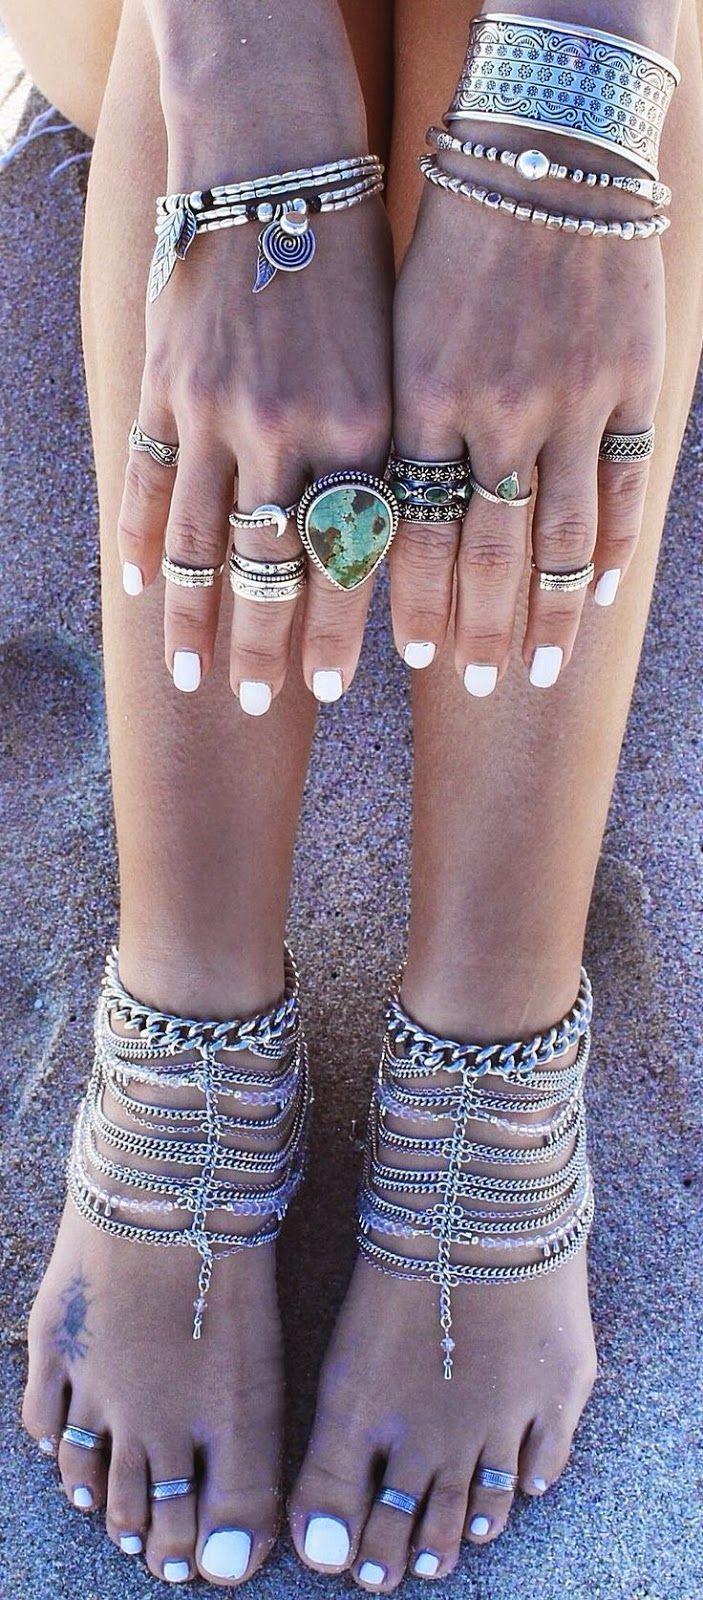 ~summertime accessories~